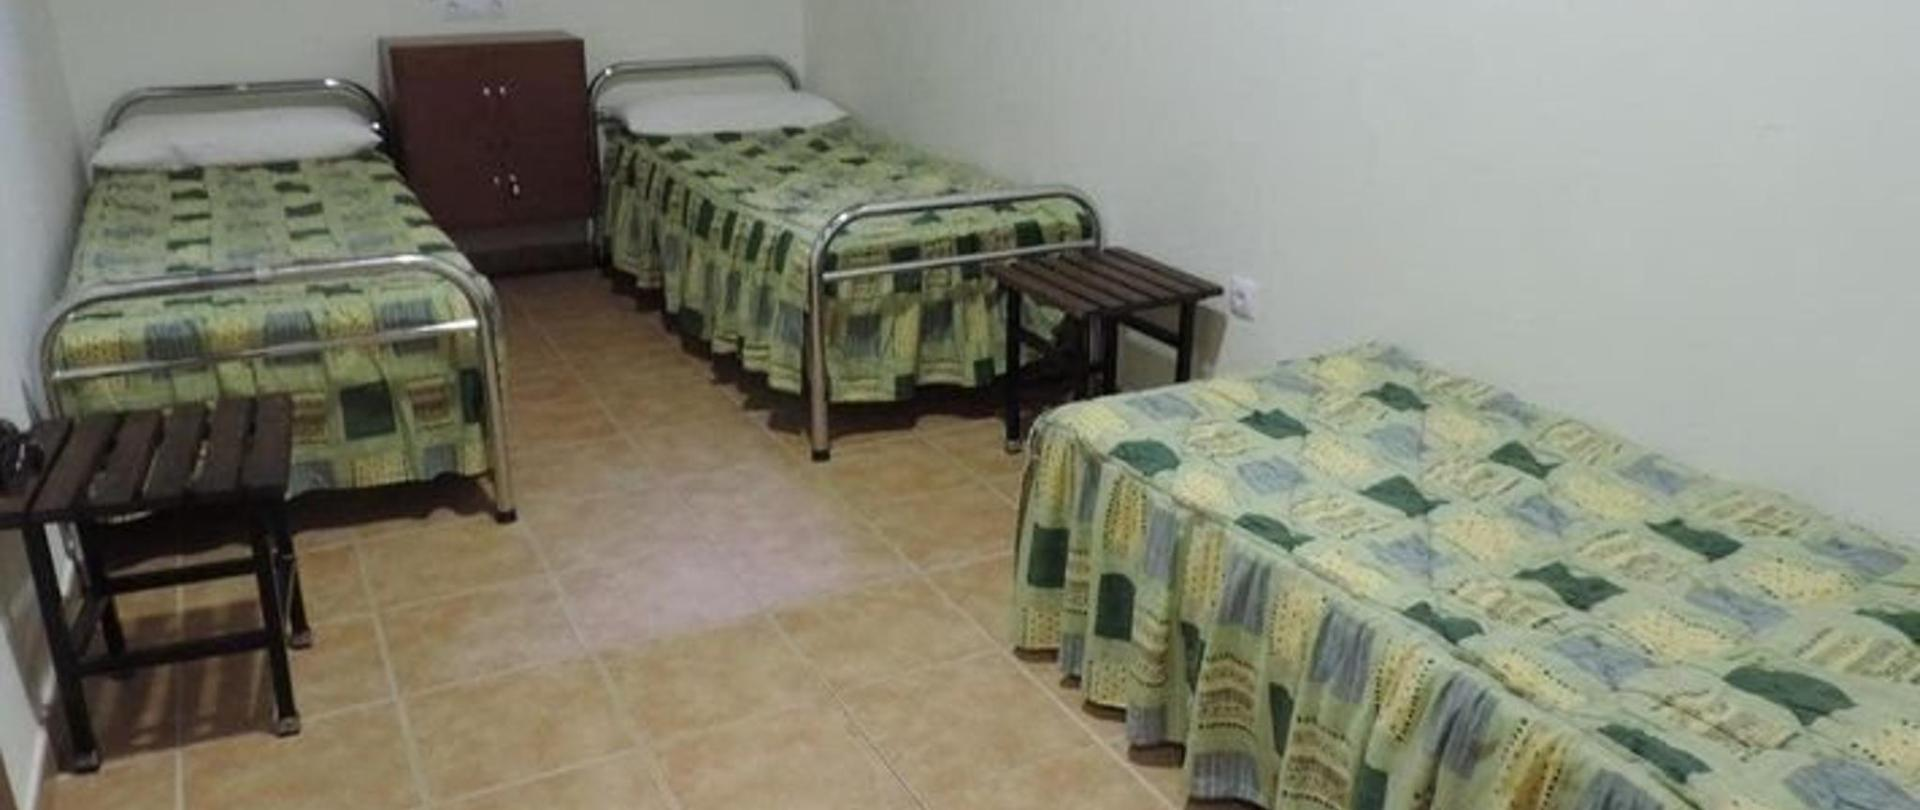 Habitación triple con baño a compartir.jpg